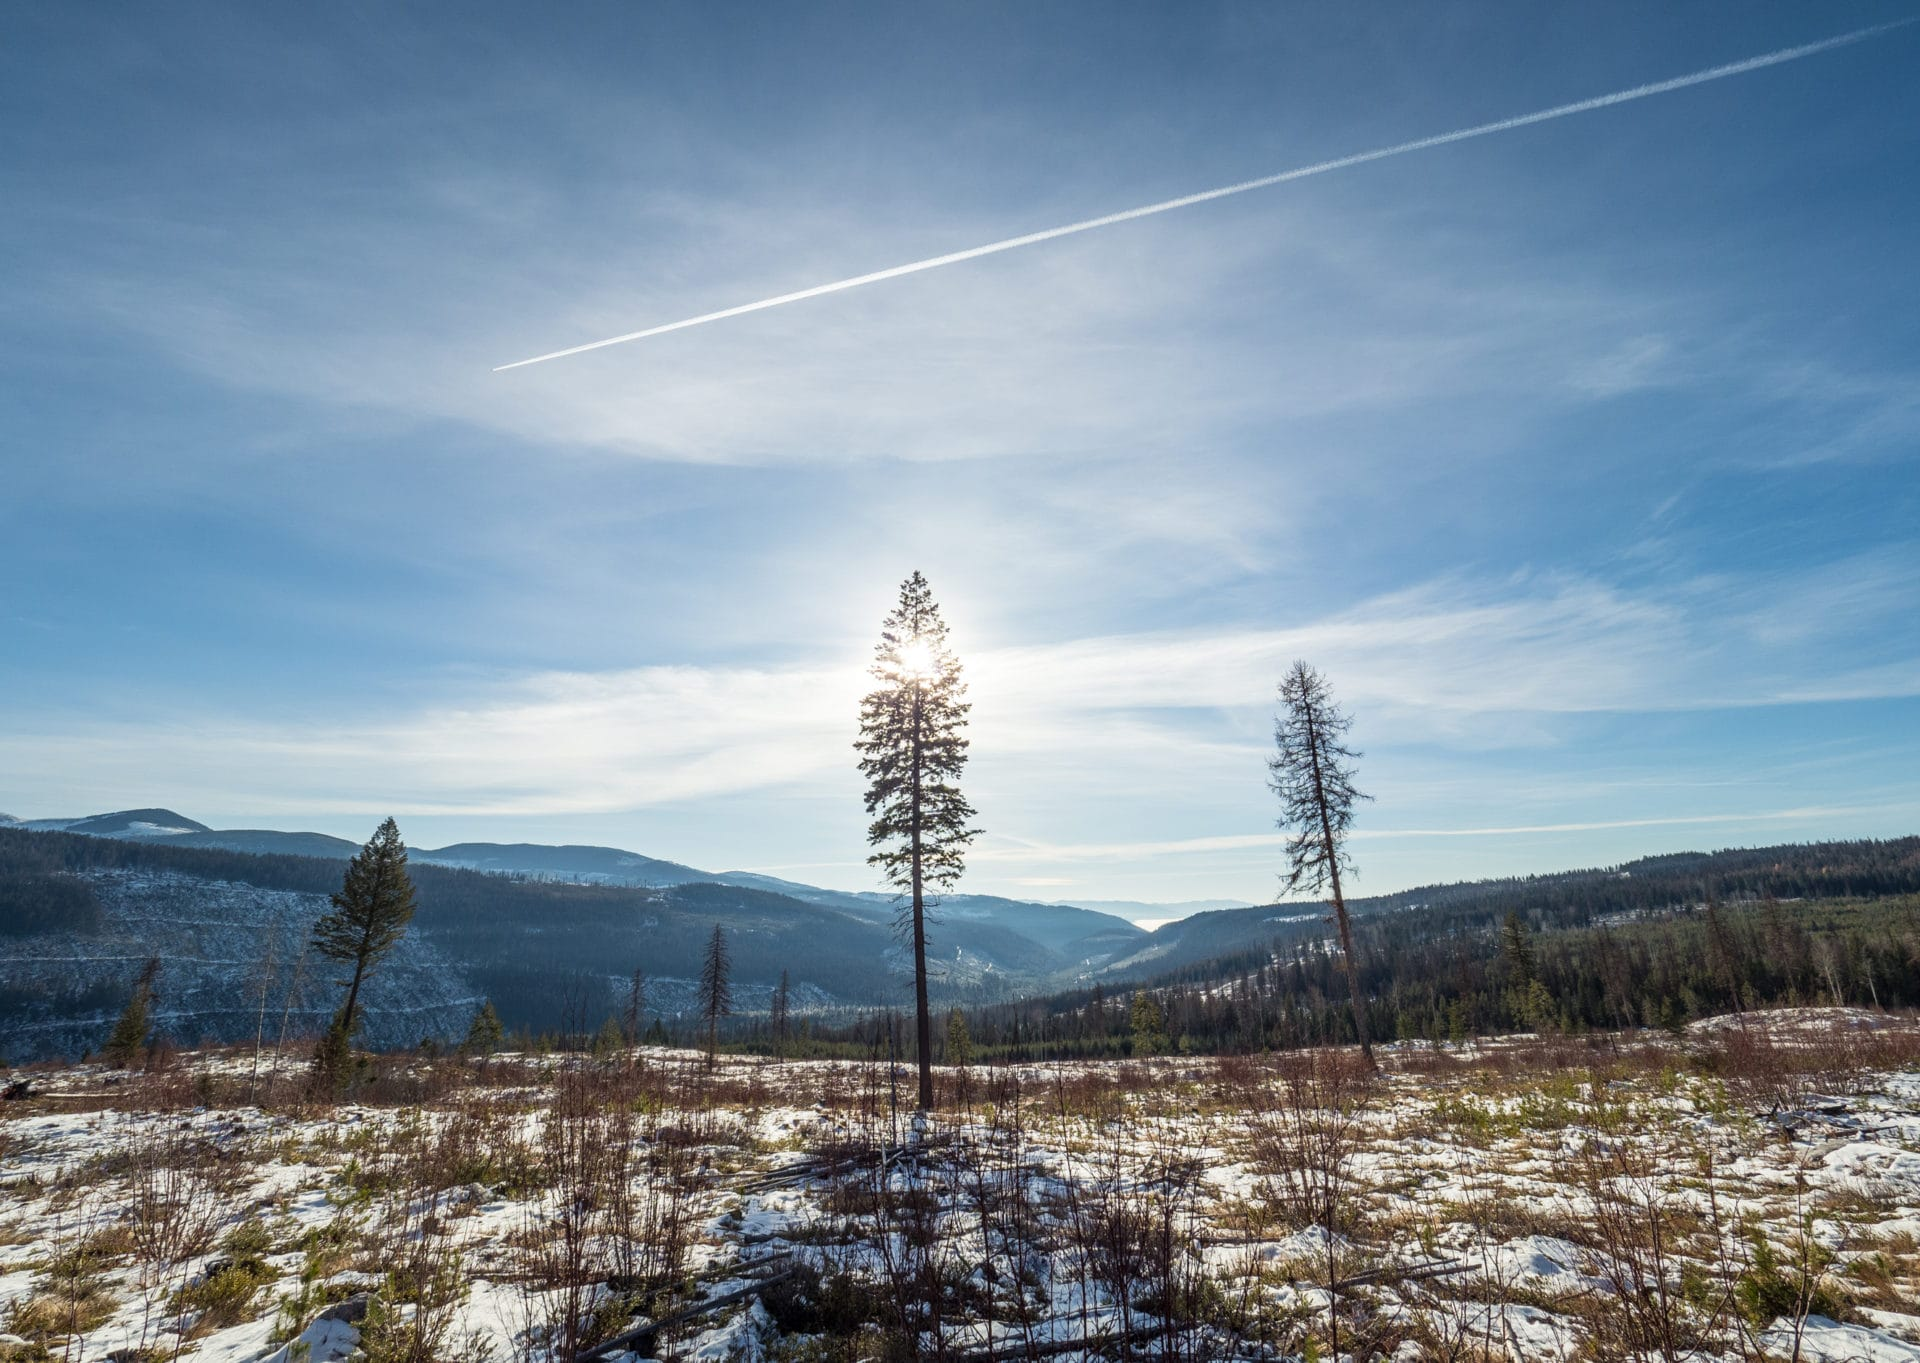 Grand Forks cutblock logging